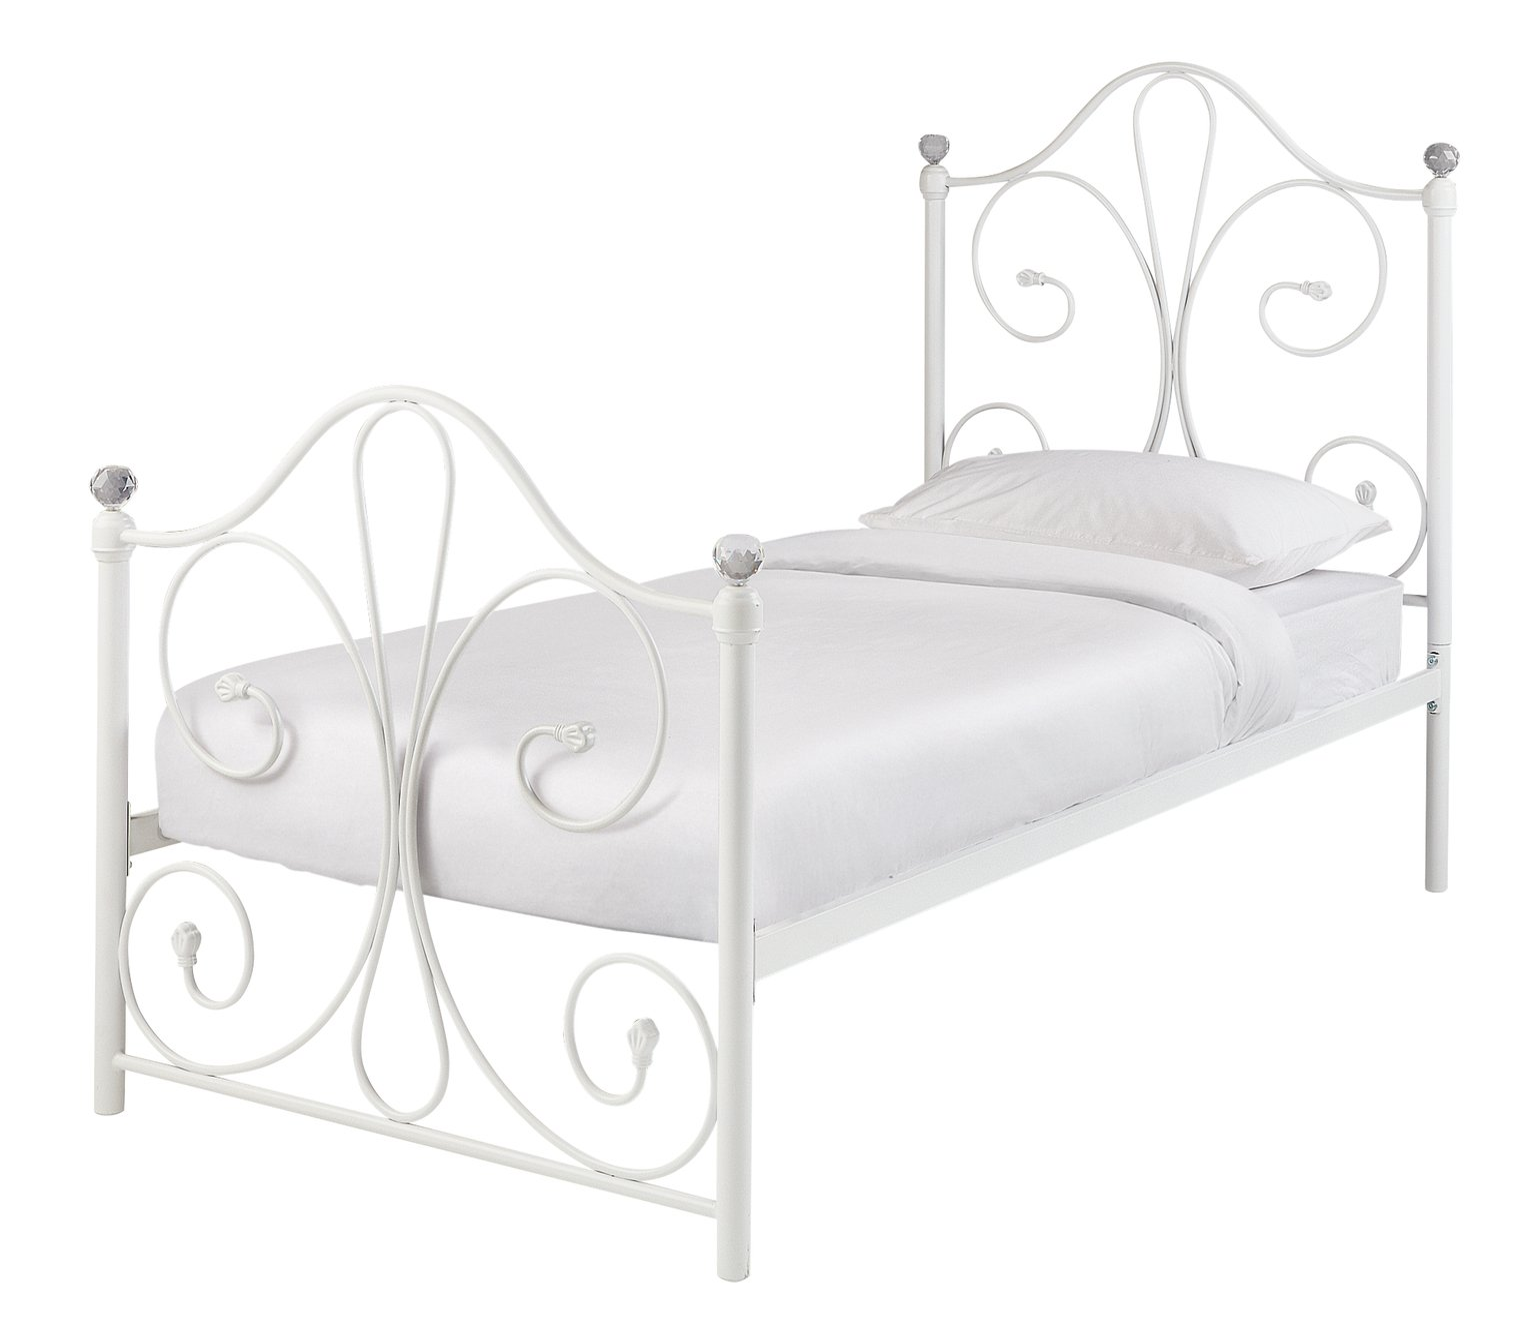 Argos Home Marietta Single Bed Frame - White